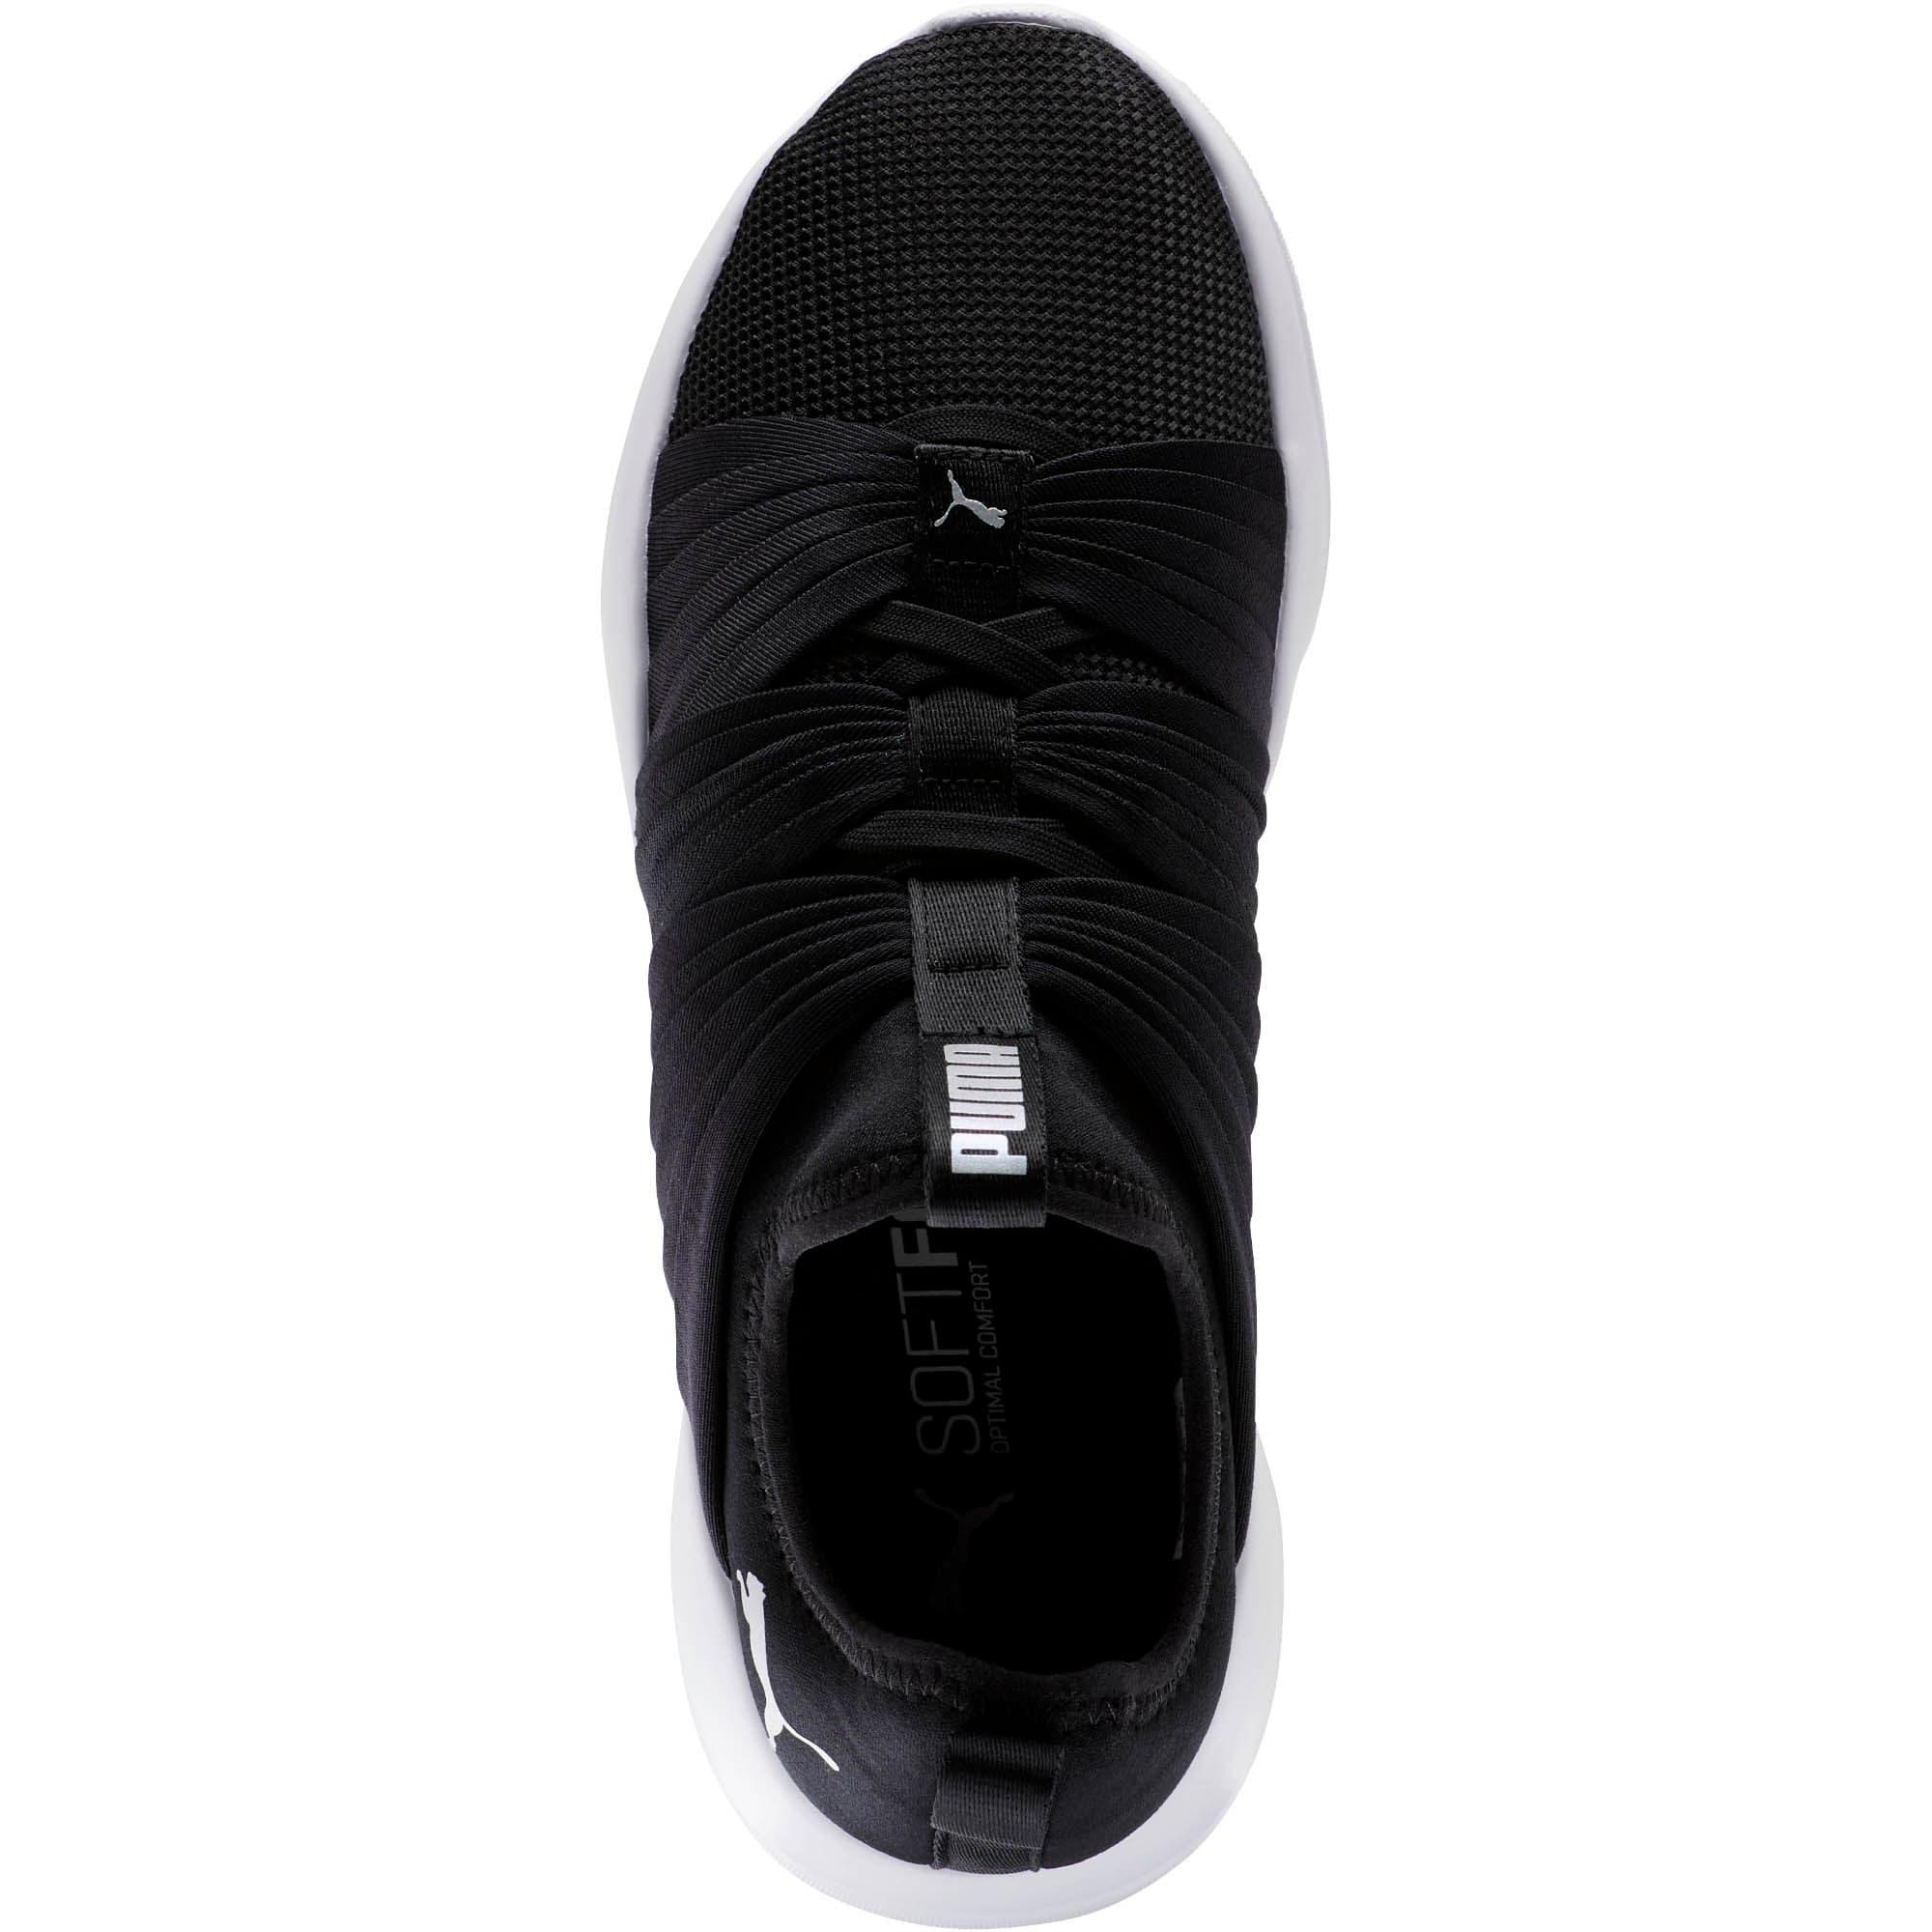 Thumbnail 5 of Flourish Stellar Women's Training Shoes, Puma Black-Puma White, medium